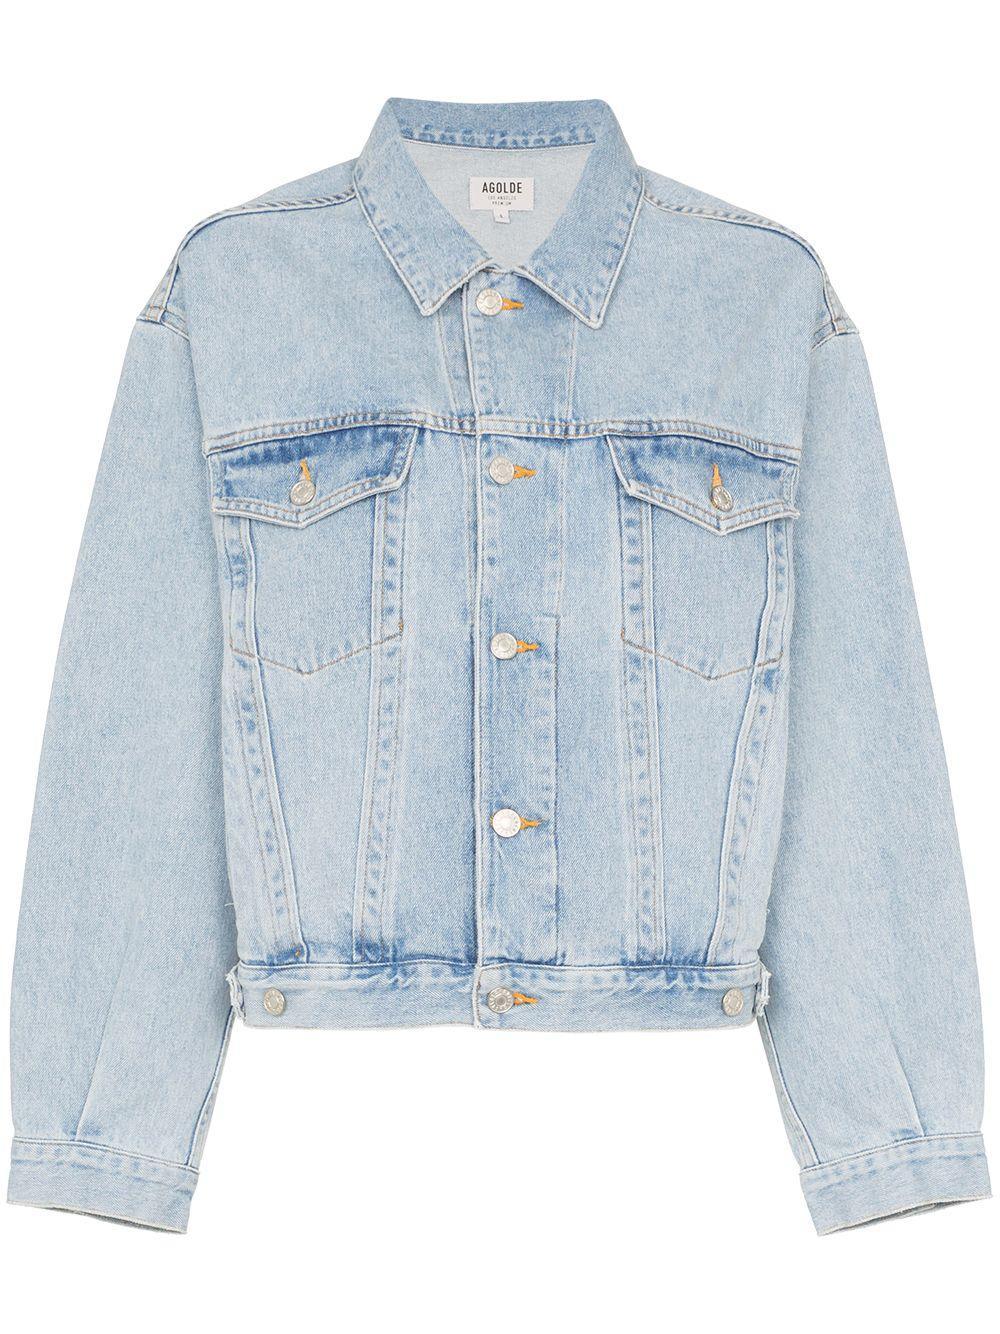 Charli Oversized Jean Jacket Item # A5010-778